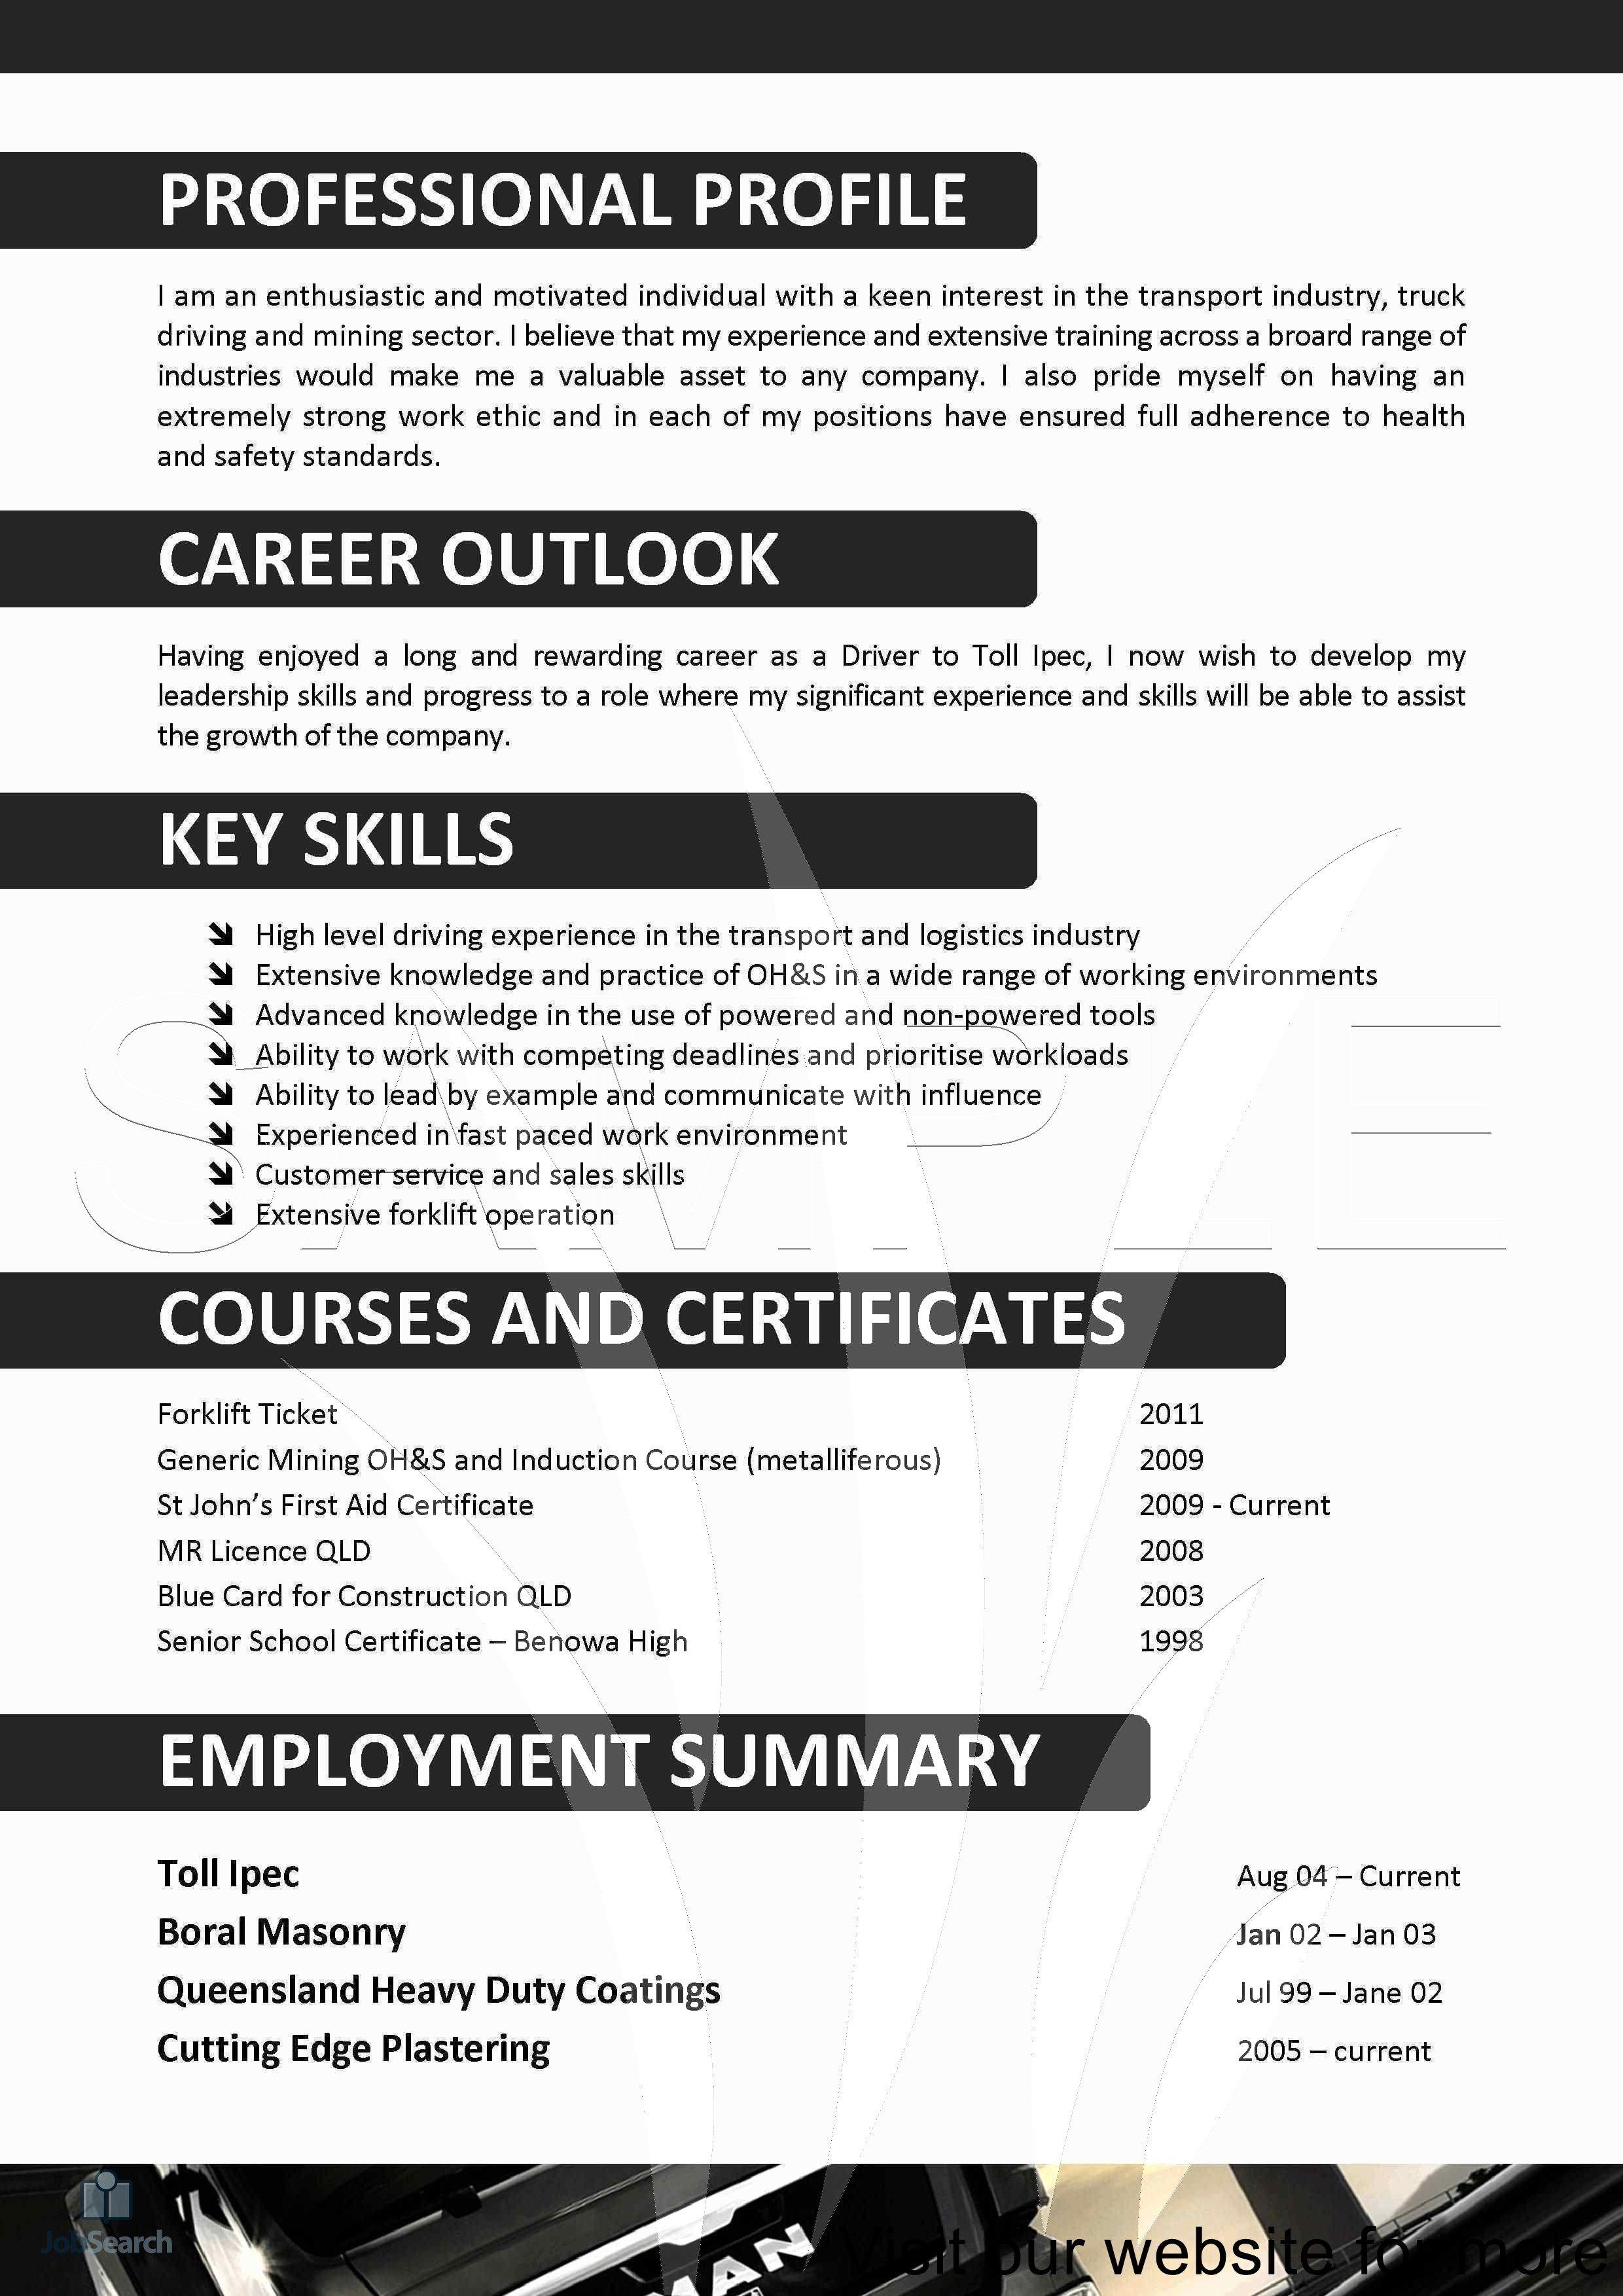 resume design template creative in 2020 Resume pdf, Job